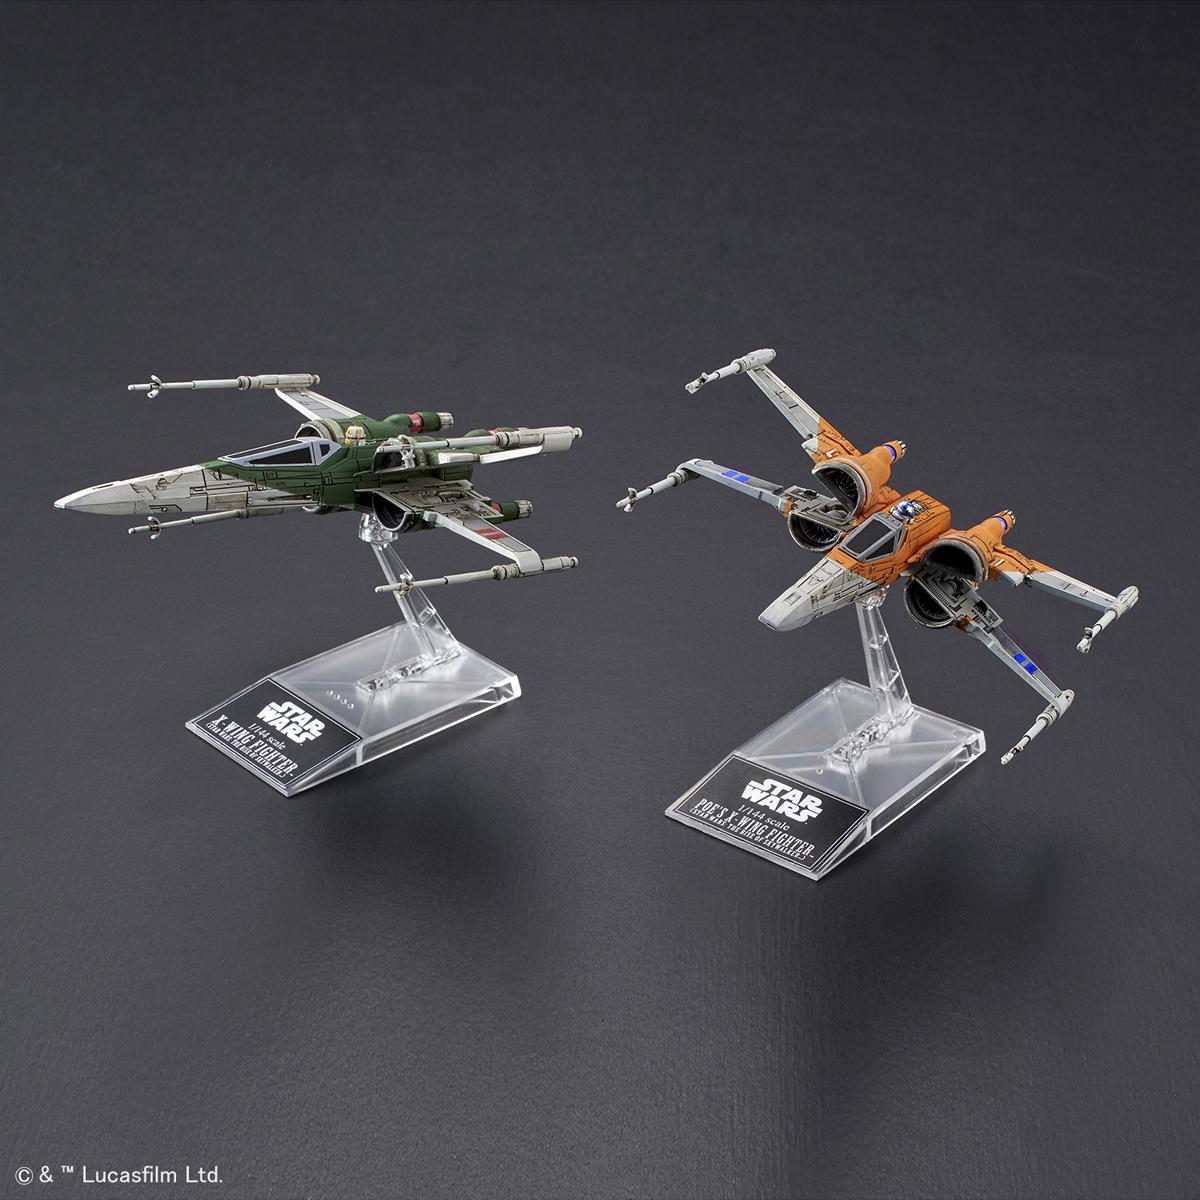 1/144 X翼戰機 波・戴姆倫座機 & X翼戰機《STAR WARS:天行者的崛起》